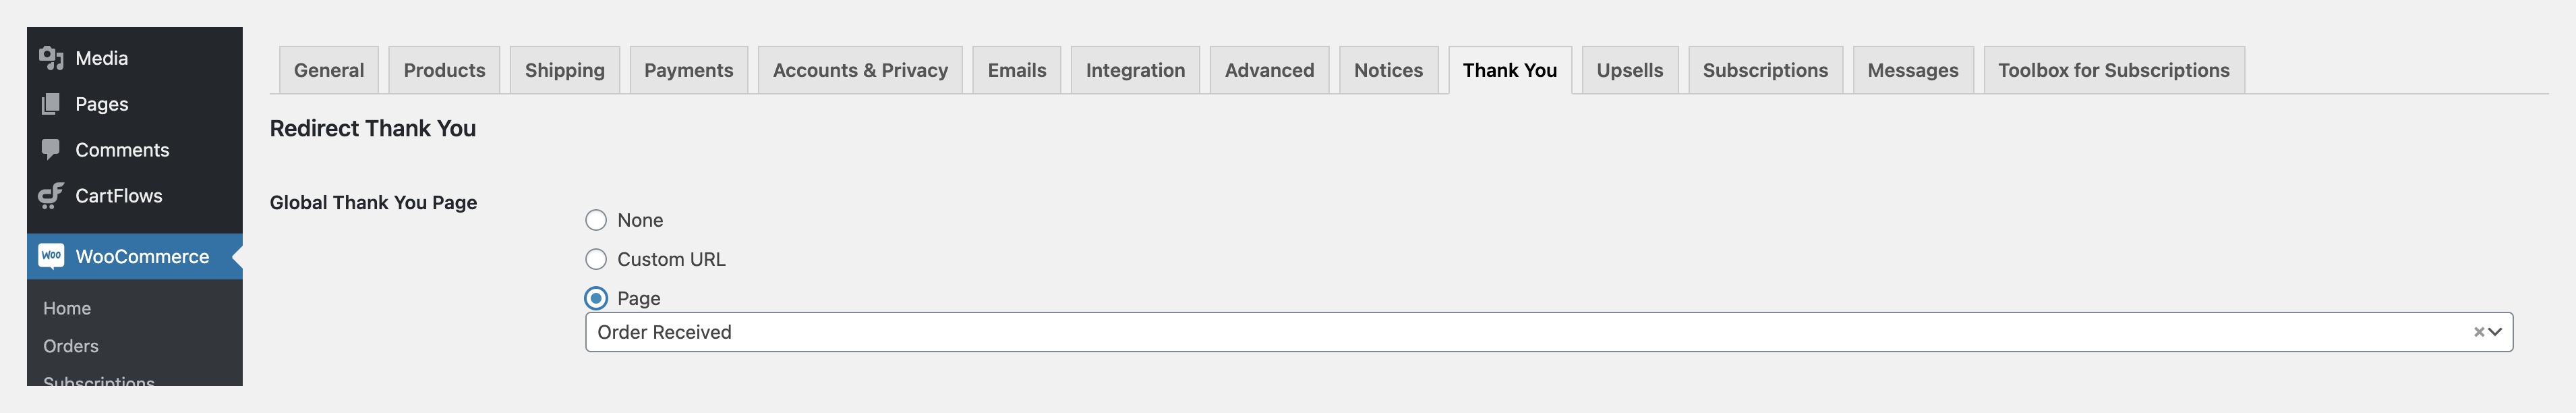 Redirect Global thankyou page settings